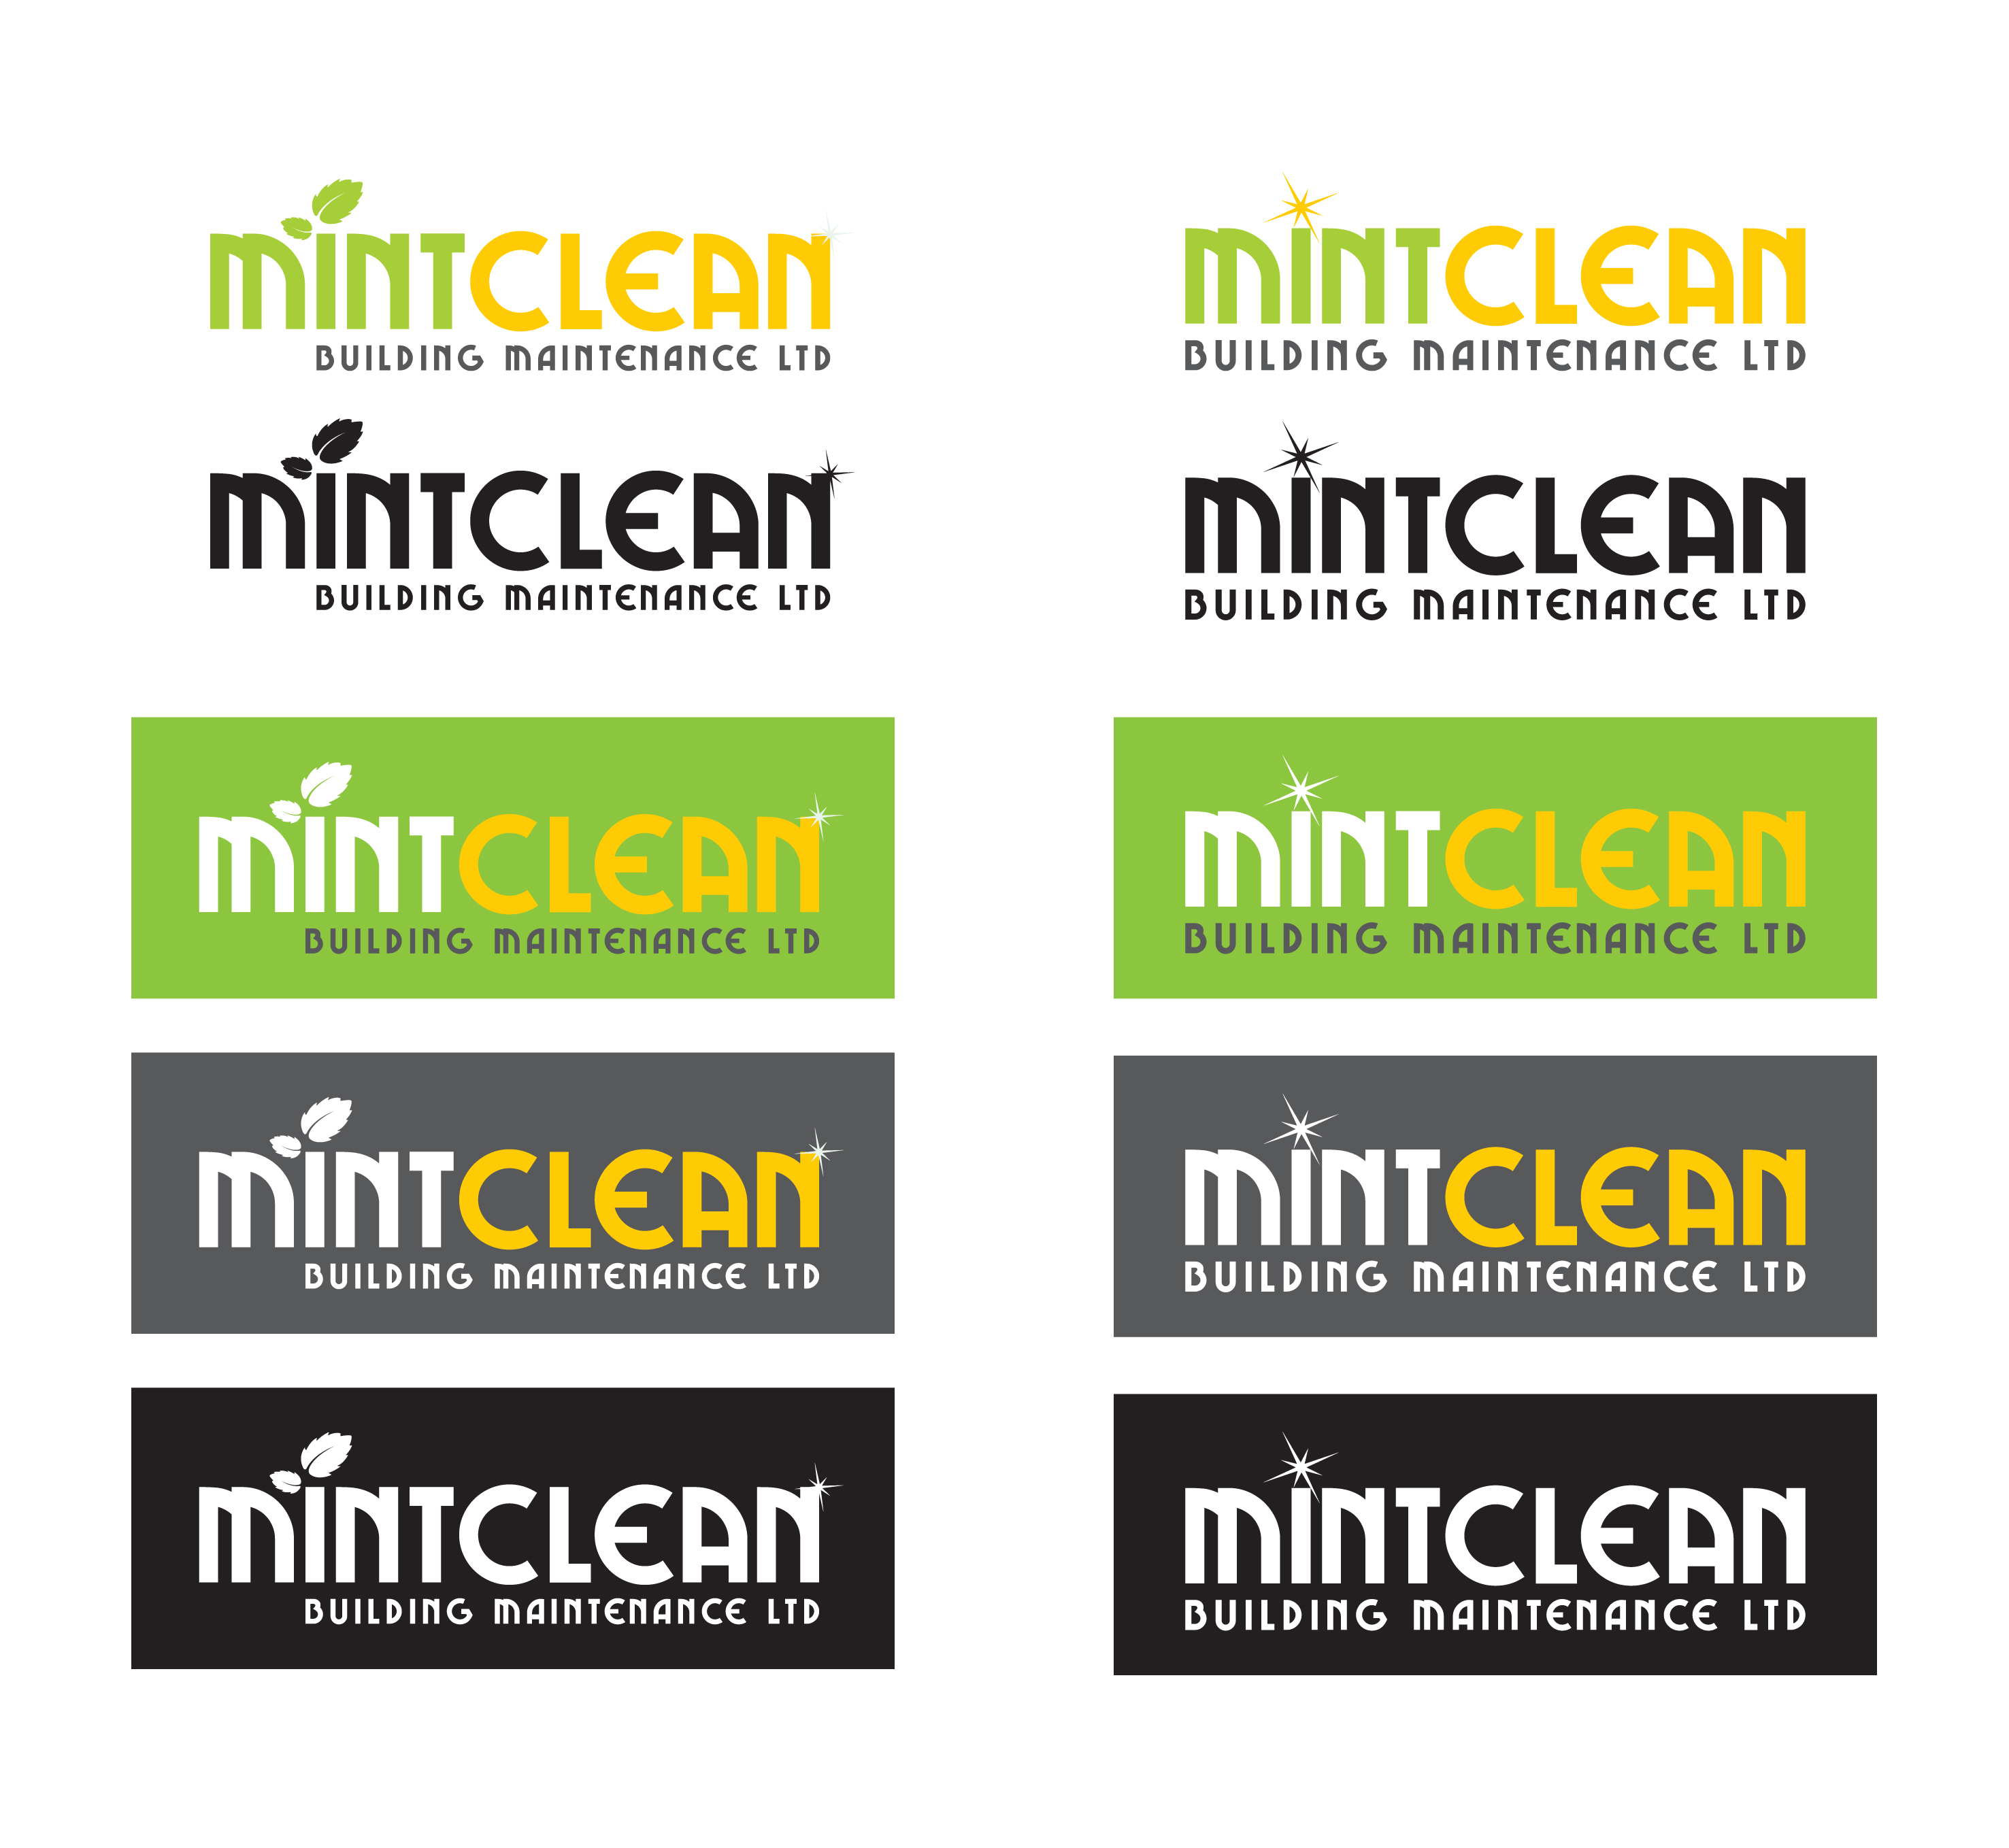 Logo Design by Vasil Boyadzhiev - Entry No. 109 in the Logo Design Contest MintClean Building Maintenance Ltd. Logo Design.